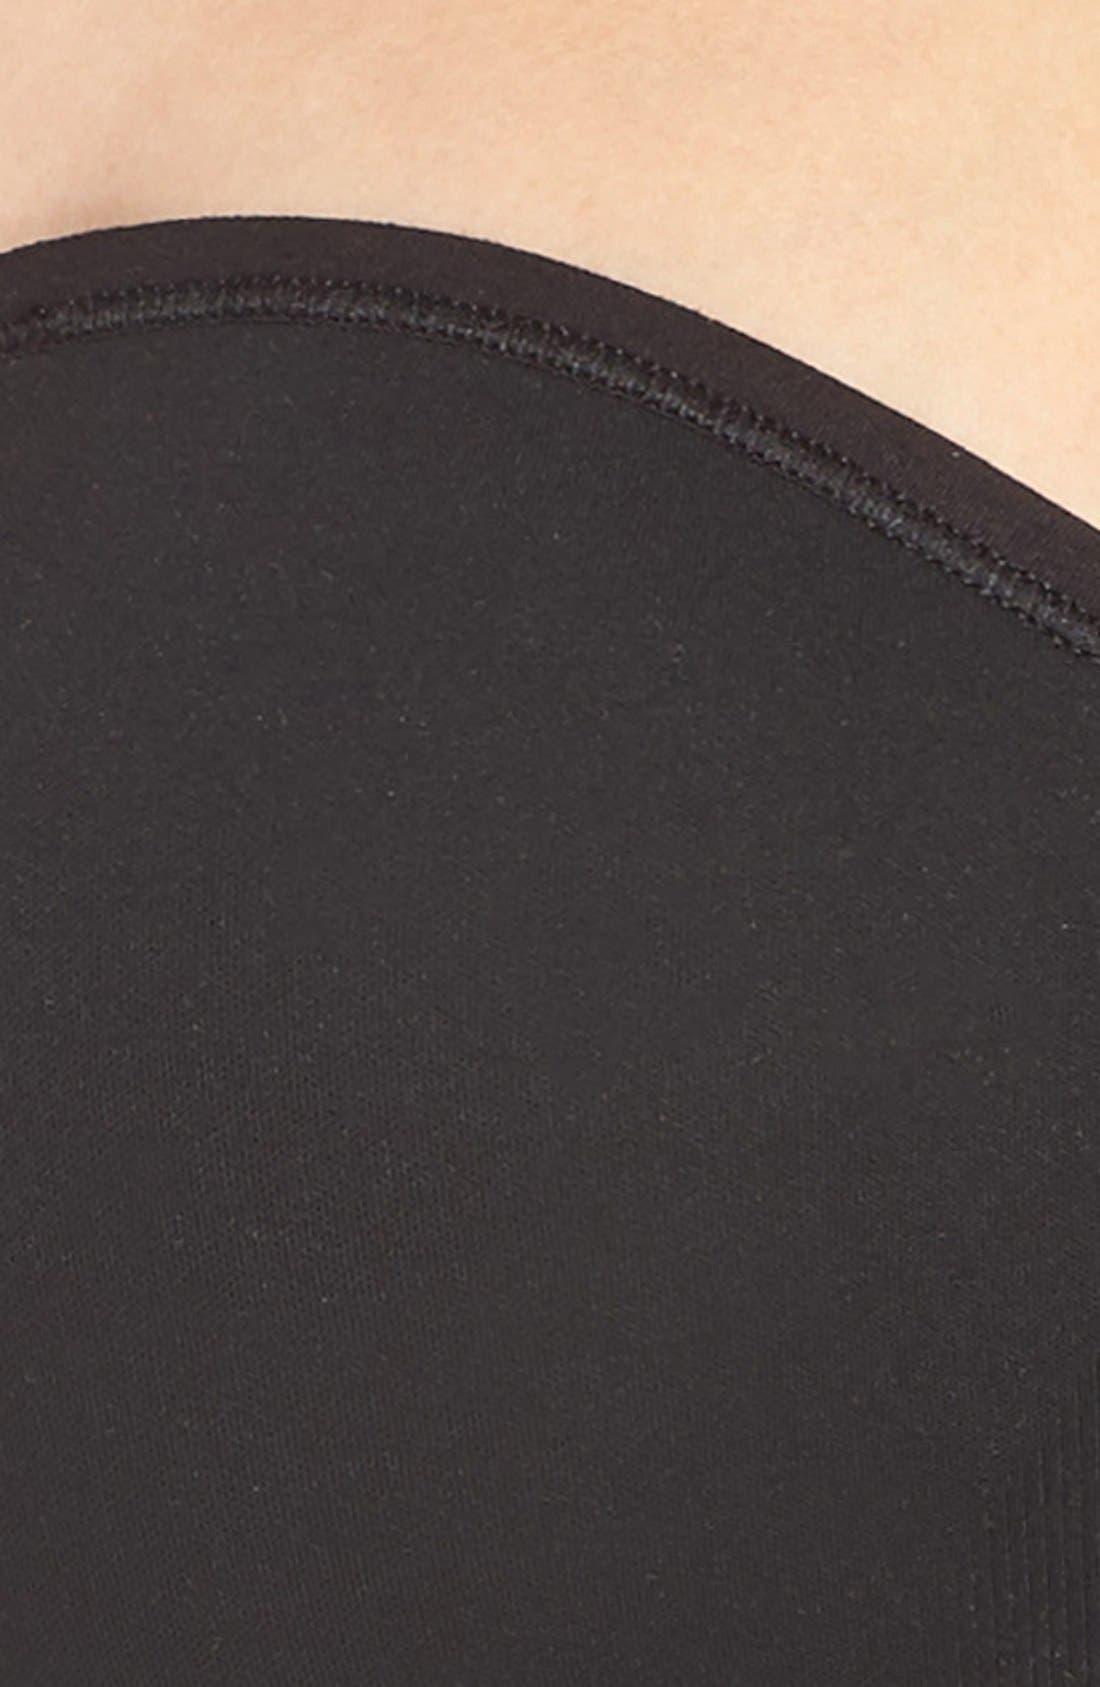 'Peyton' Convertible Wireless Bra,                             Alternate thumbnail 5, color,                             Black